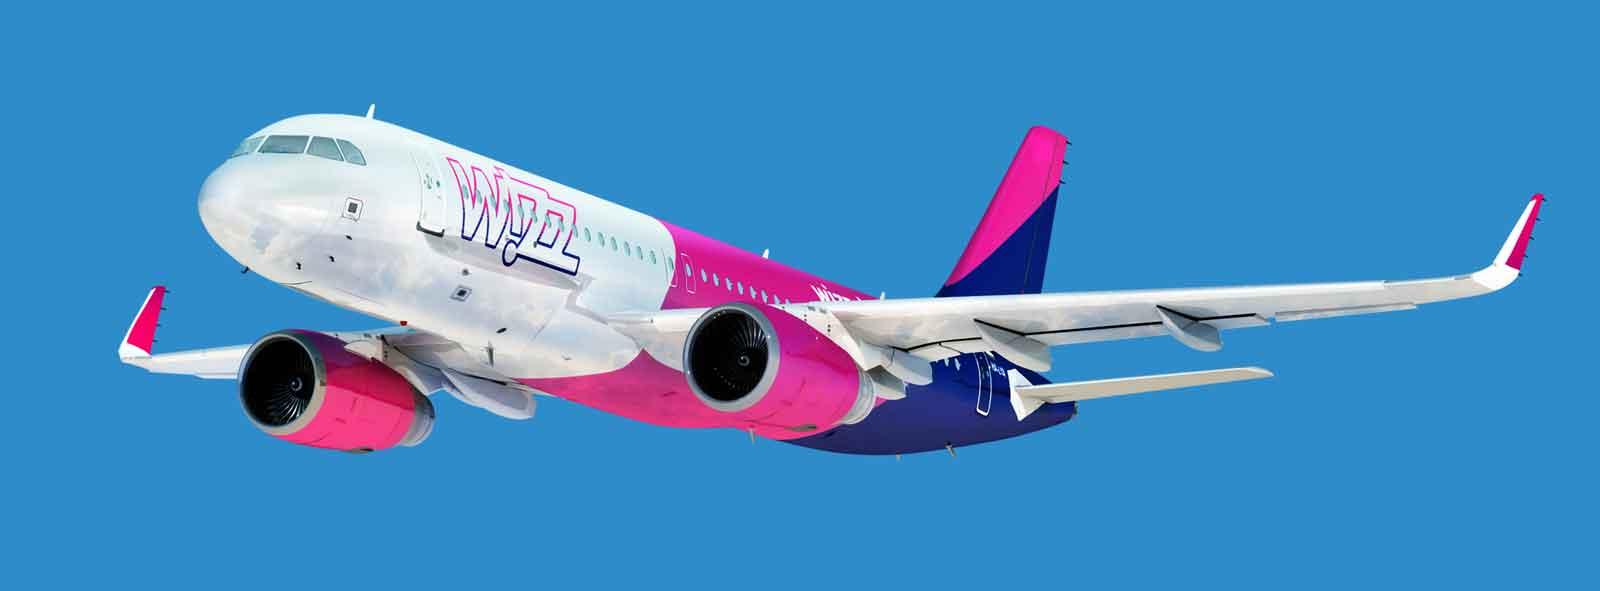 Whizz Air A320 Pilot Training to use advanced simulators